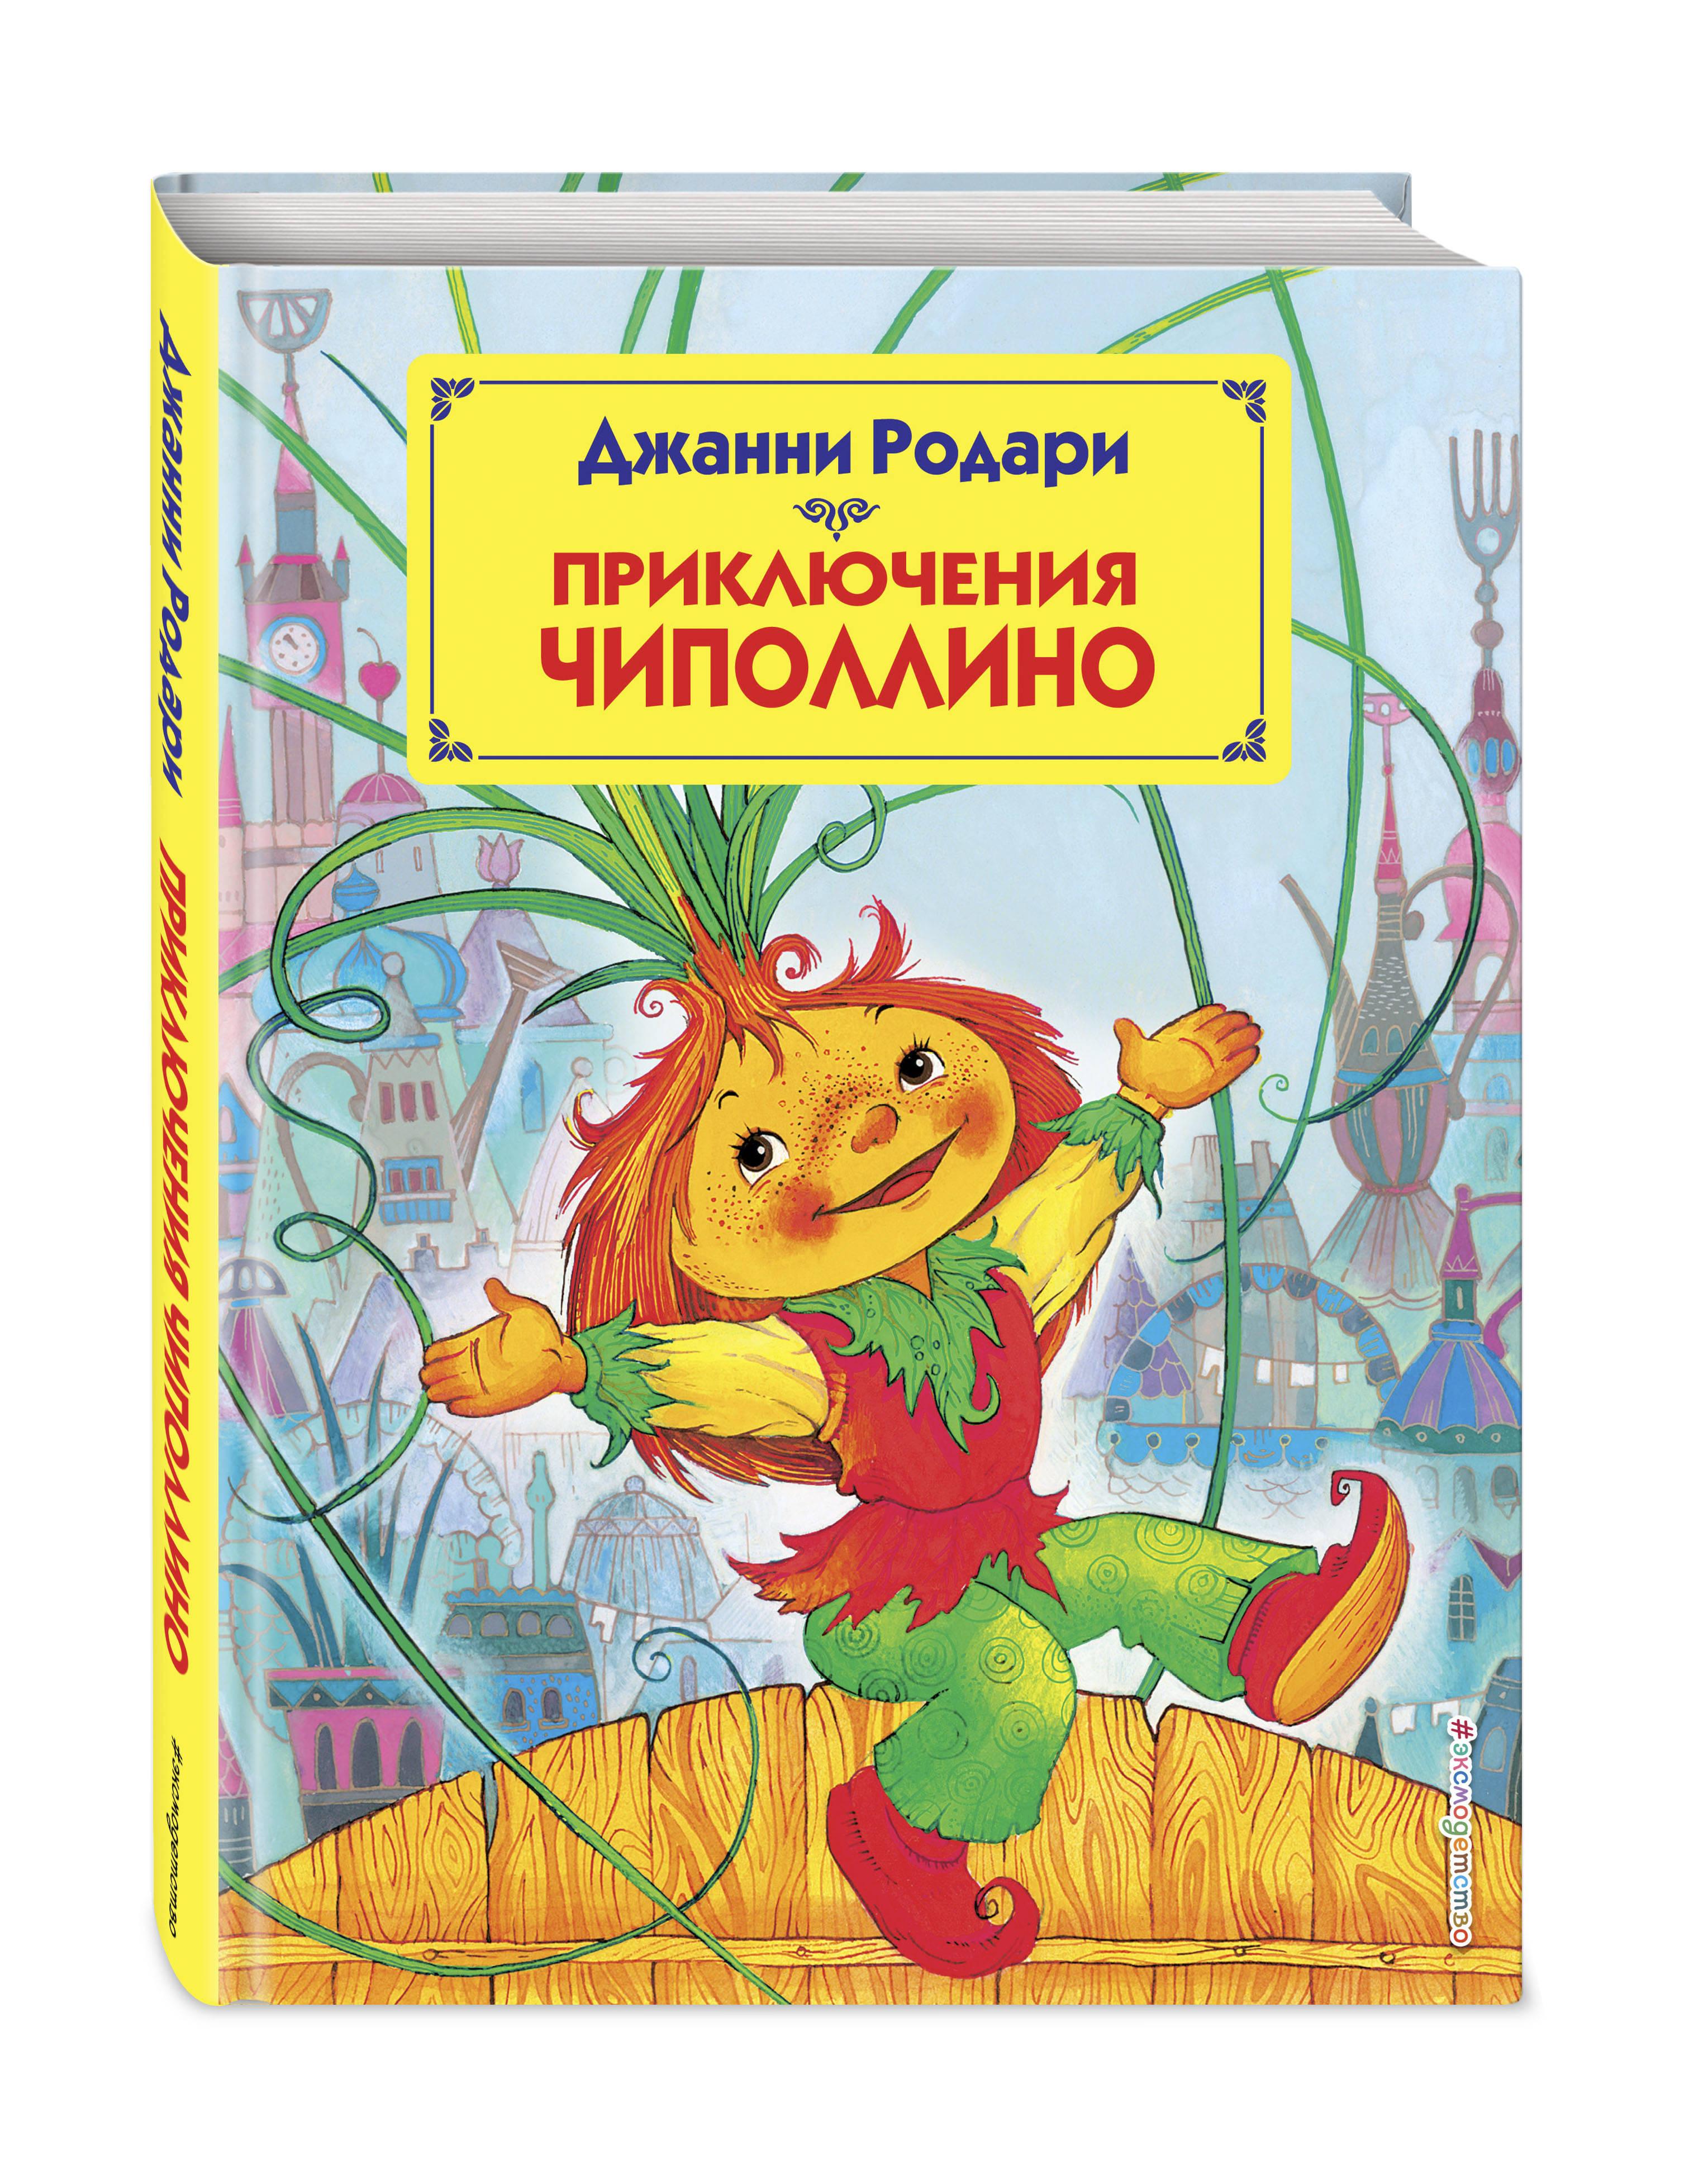 Джанни Родари Приключения Чиполлино (ил. М. Митрофанова)